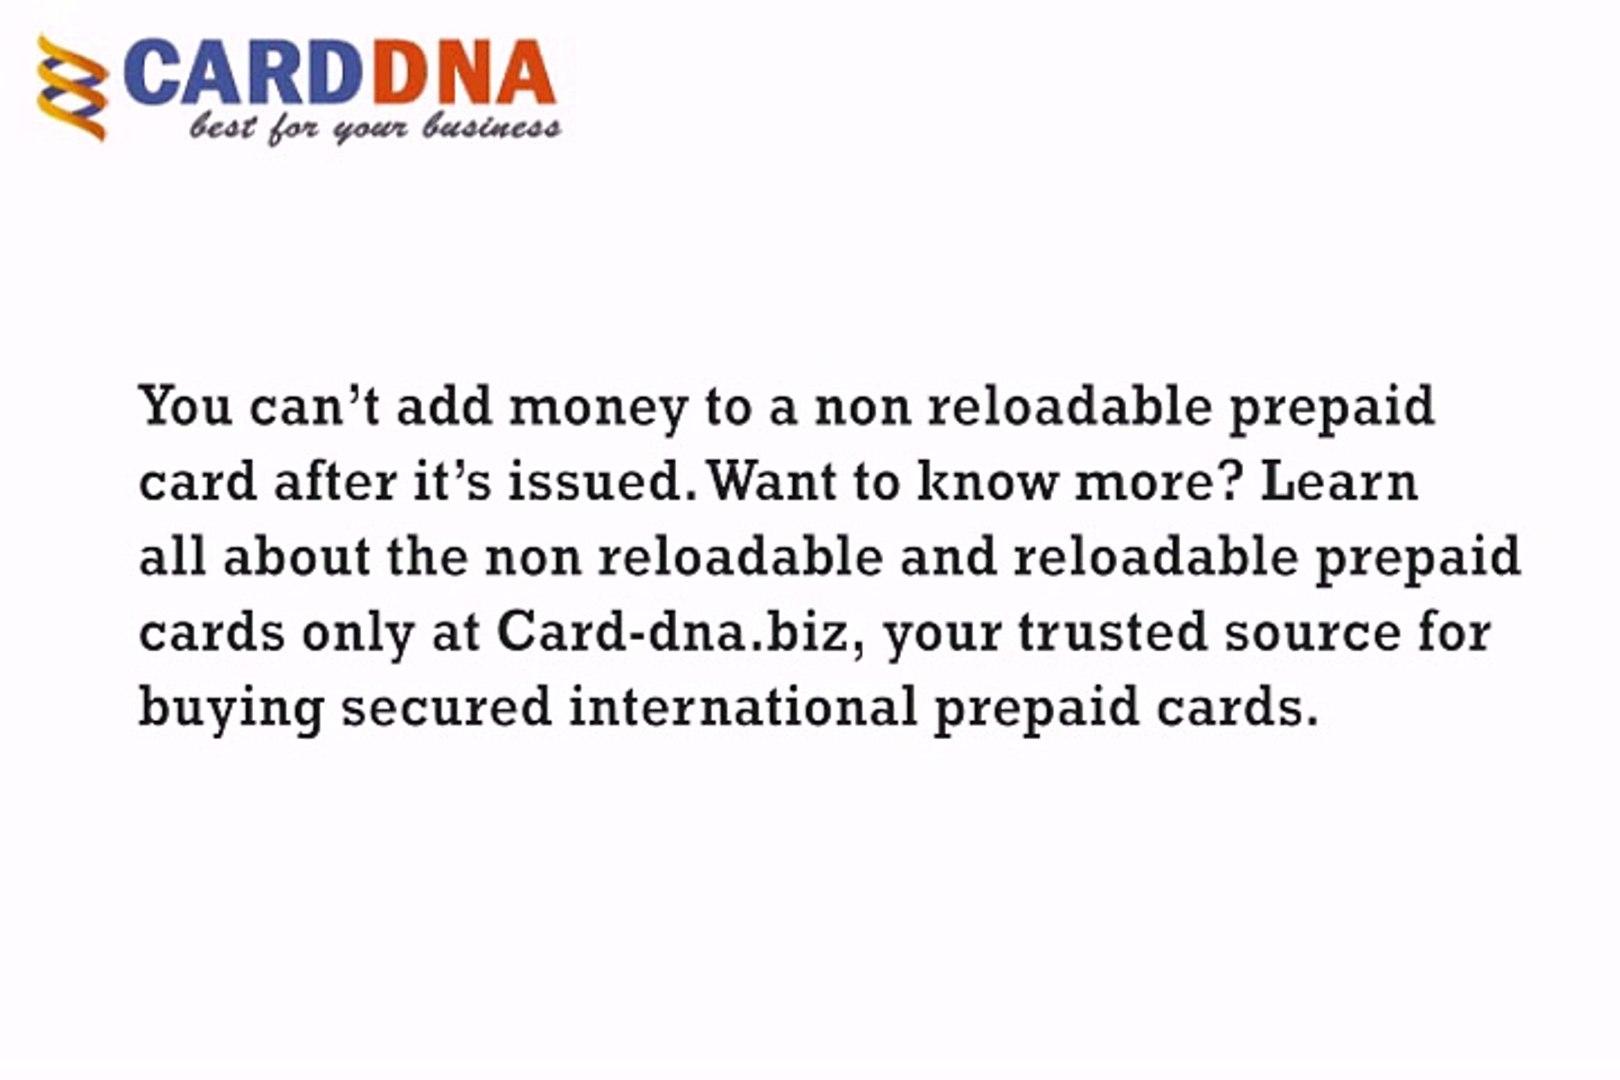 Reloadable Prepaid Cards >> Non Reloadable Prepaid Card